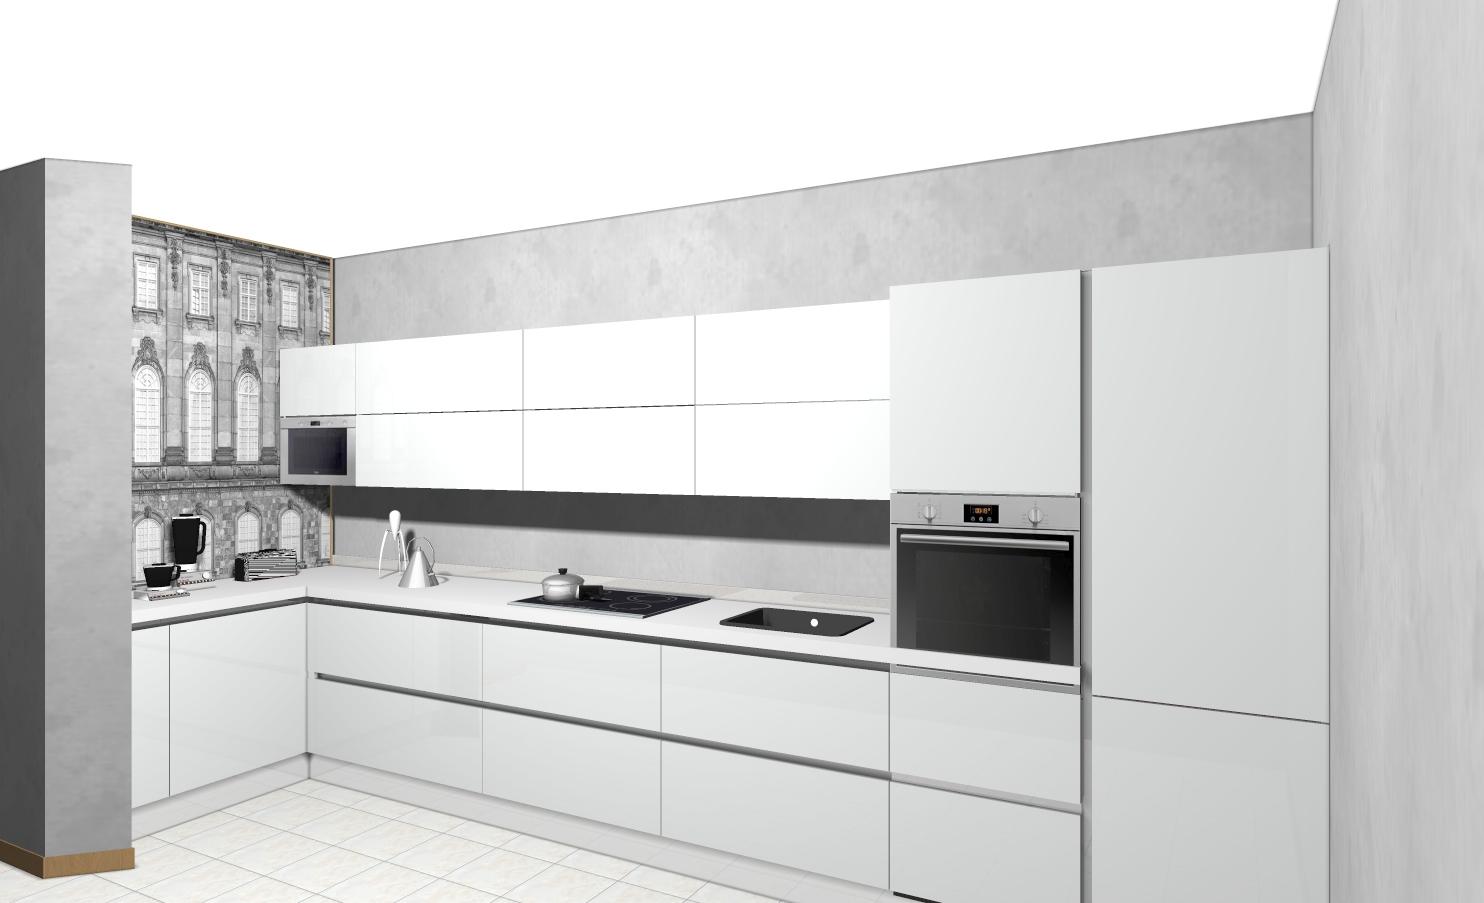 cucina e living veneta cucine - Soggiorno Veneta Cucine